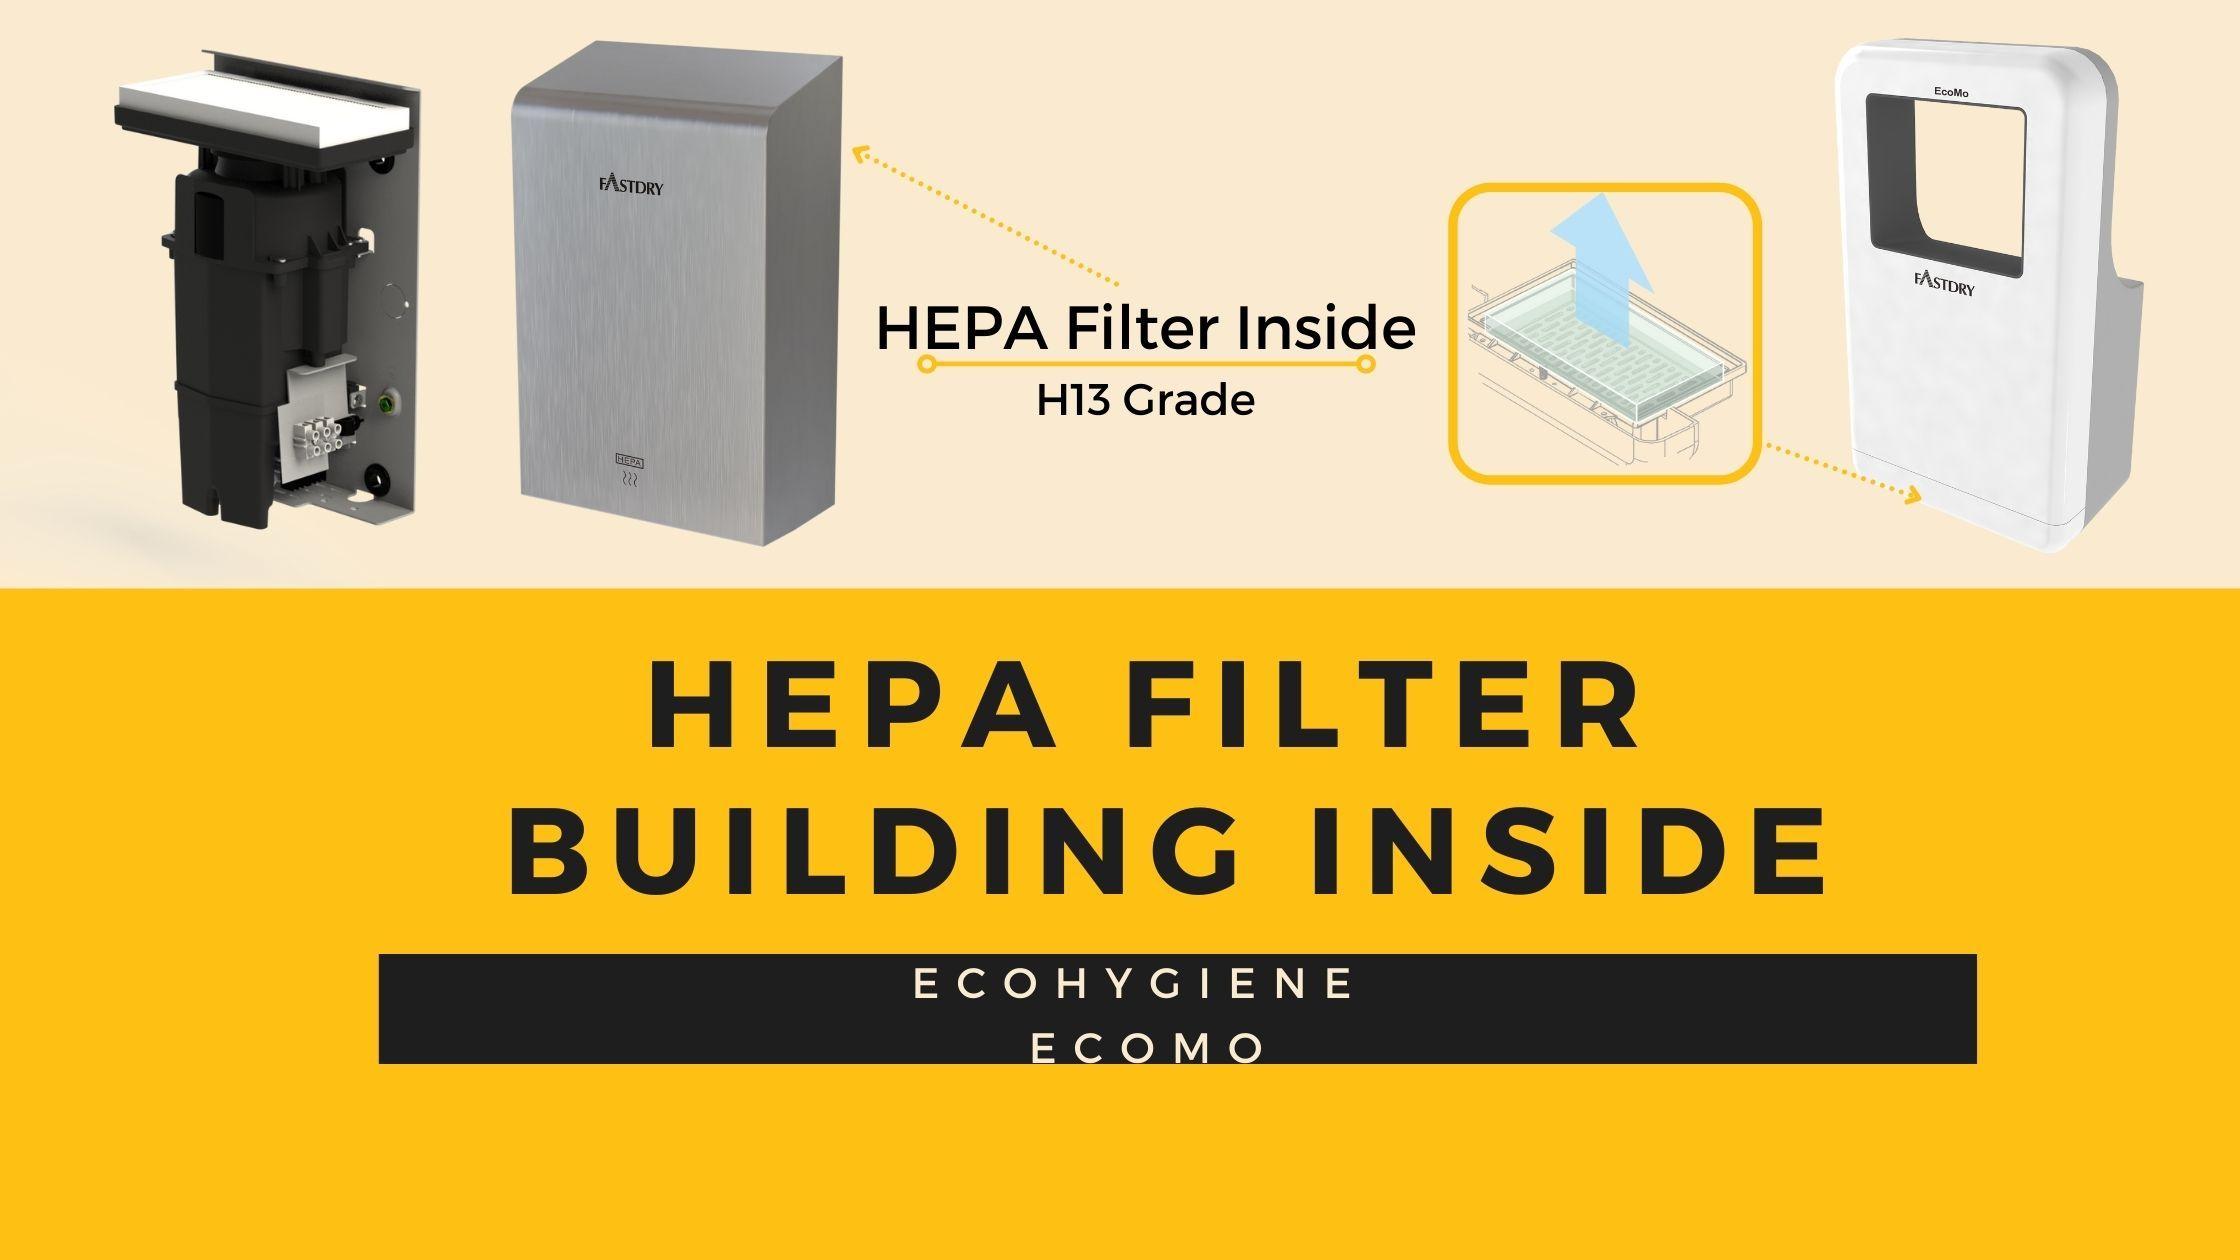 Hokwang High Speed Hand Dryer with HEPA Filter Building Inside